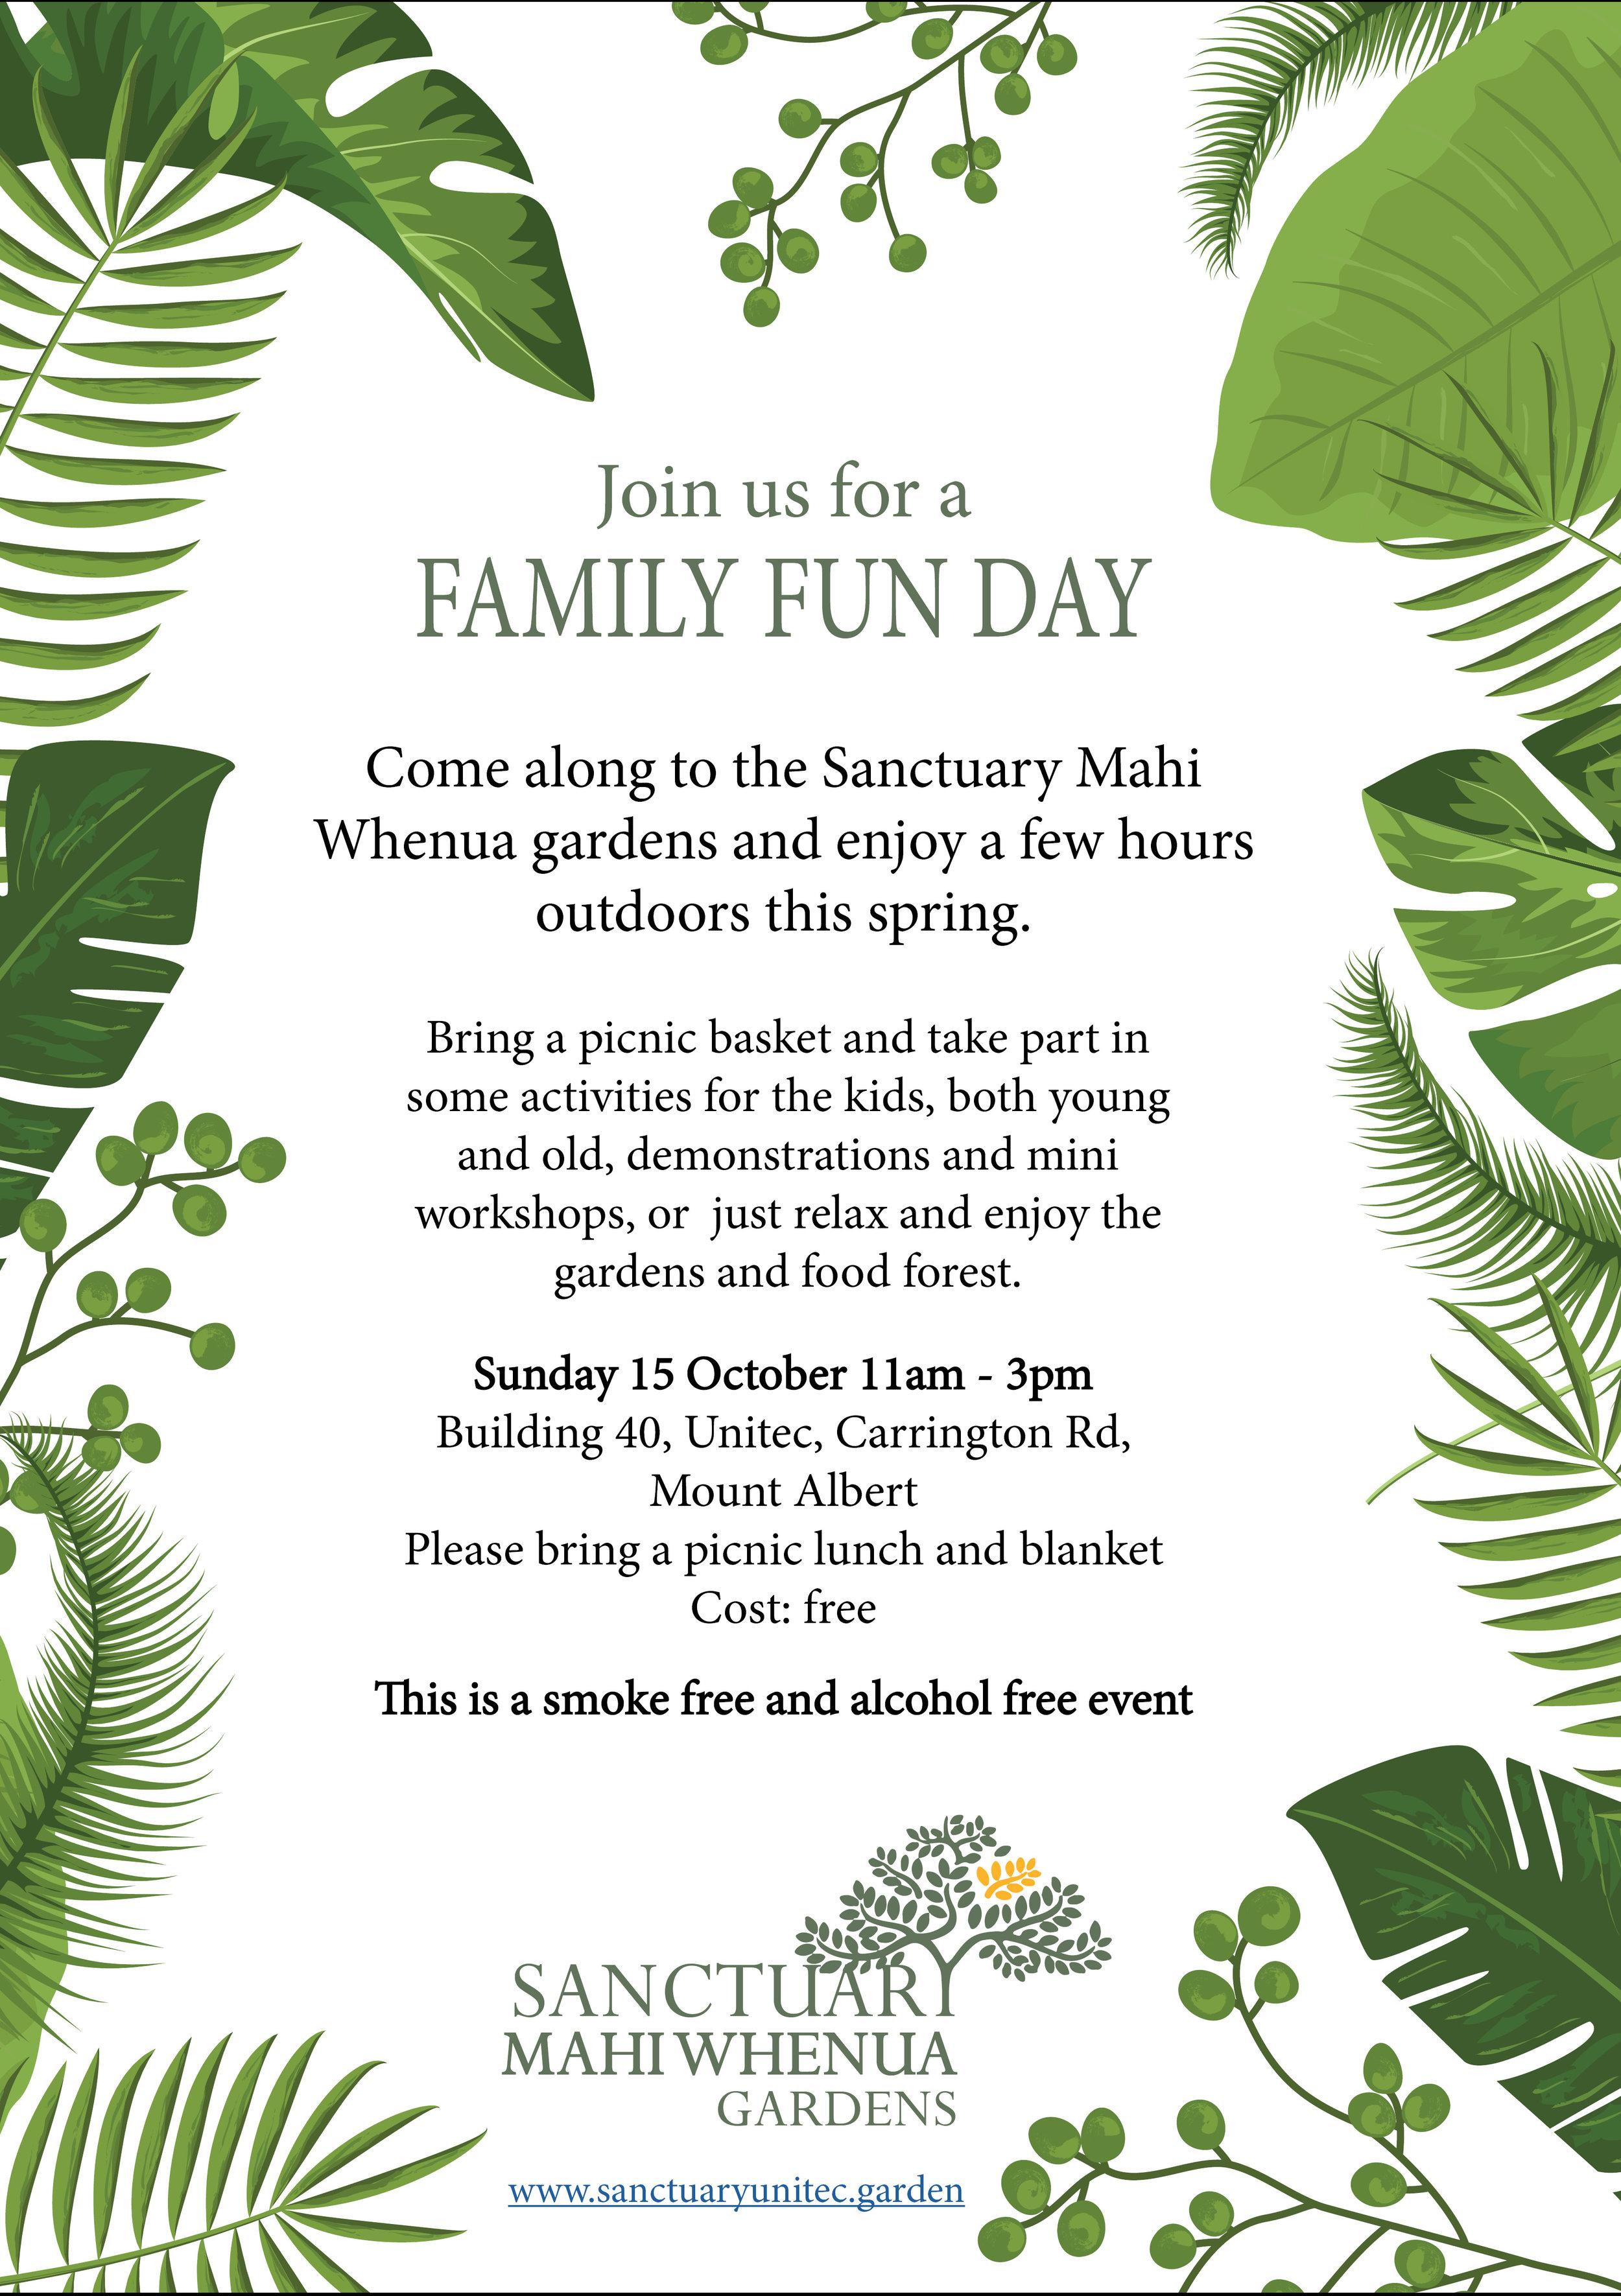 FAMILY FUN DAY INVITATION.jpg